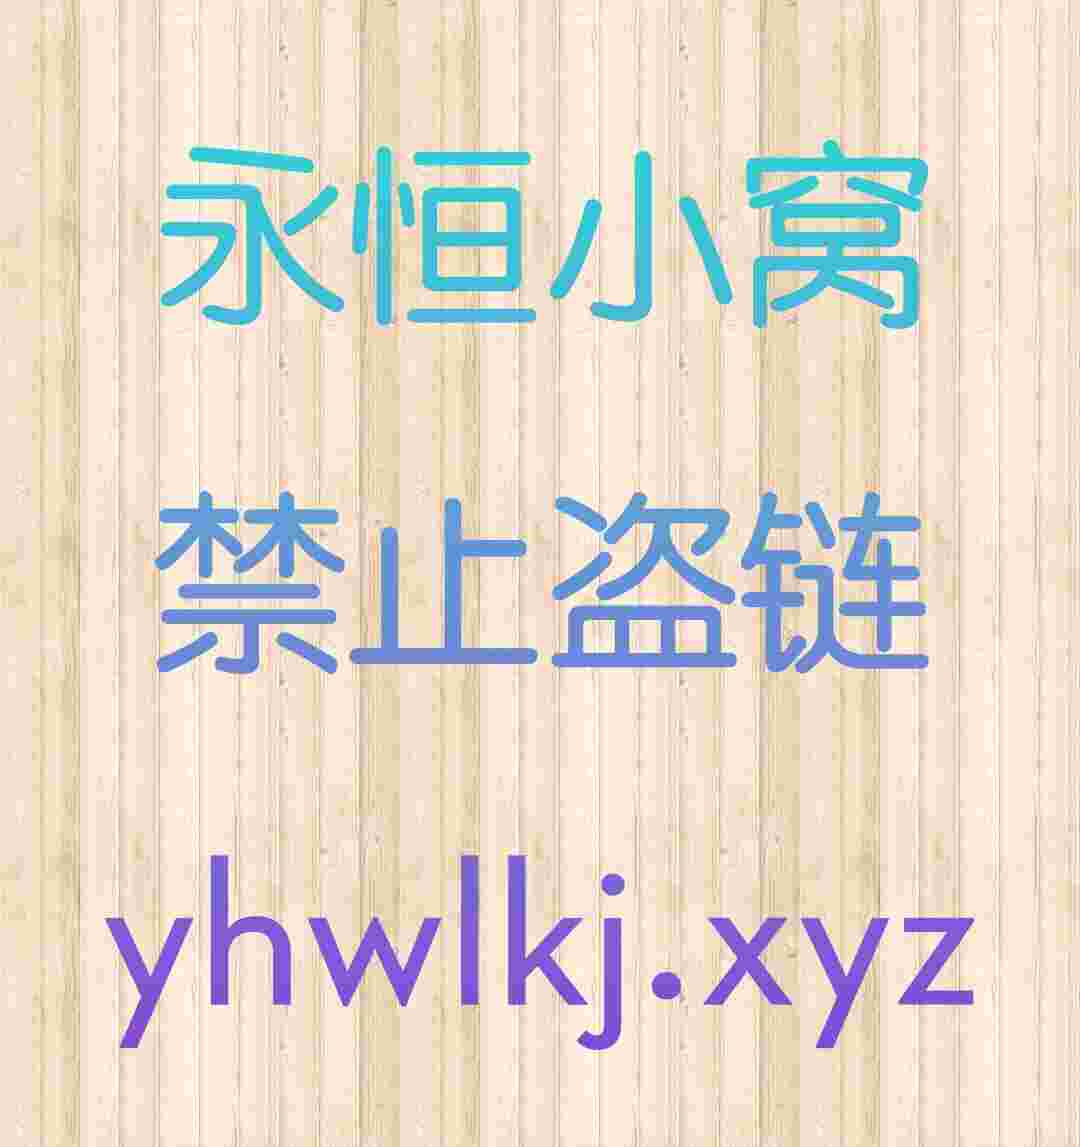 Screenshot_20210224_202346_org.mozilla.firefox_edit_41133000434868.jpg